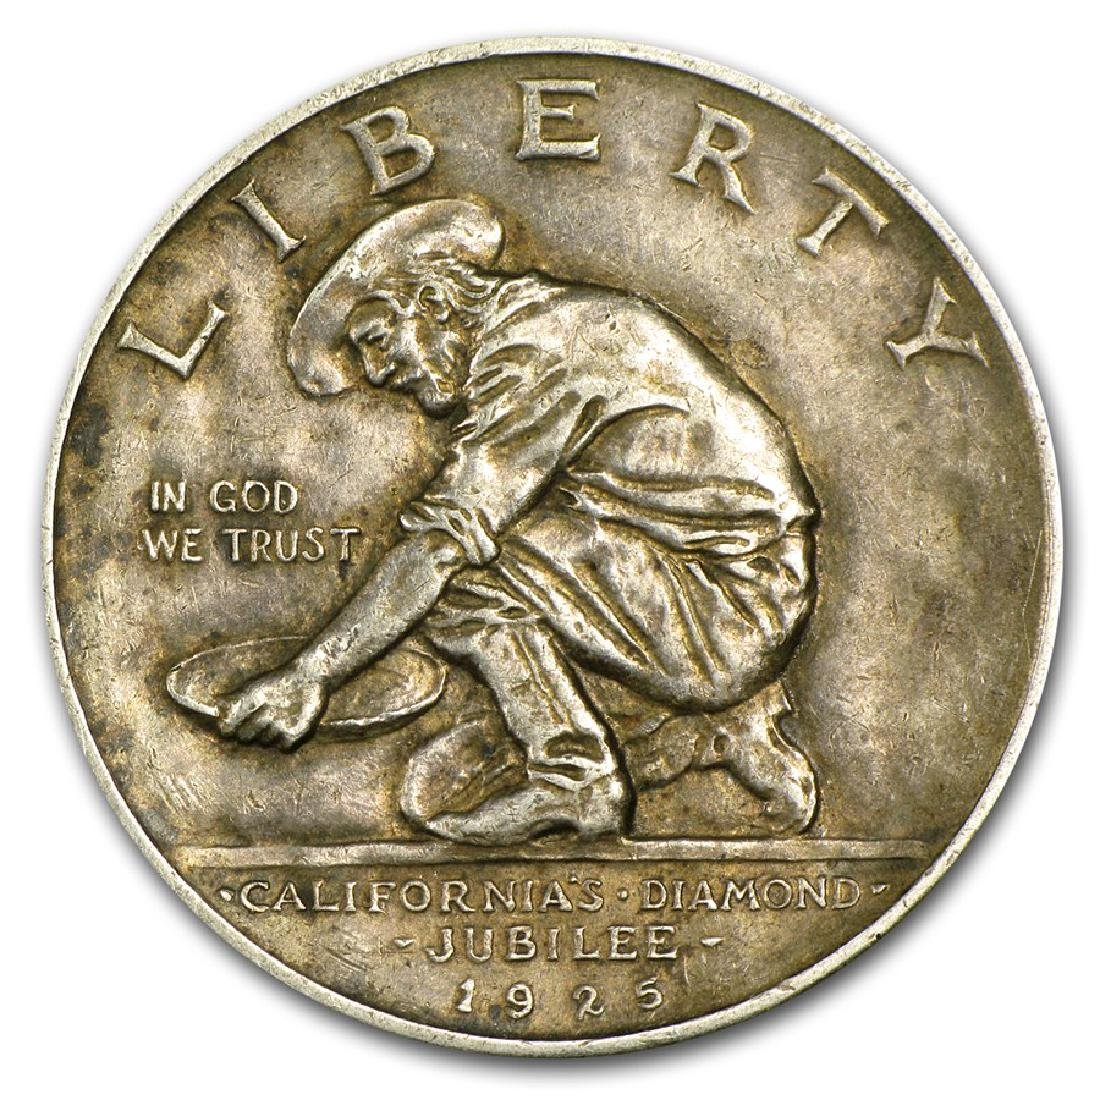 1925-S California Diamond Jubilee Commemorative Half